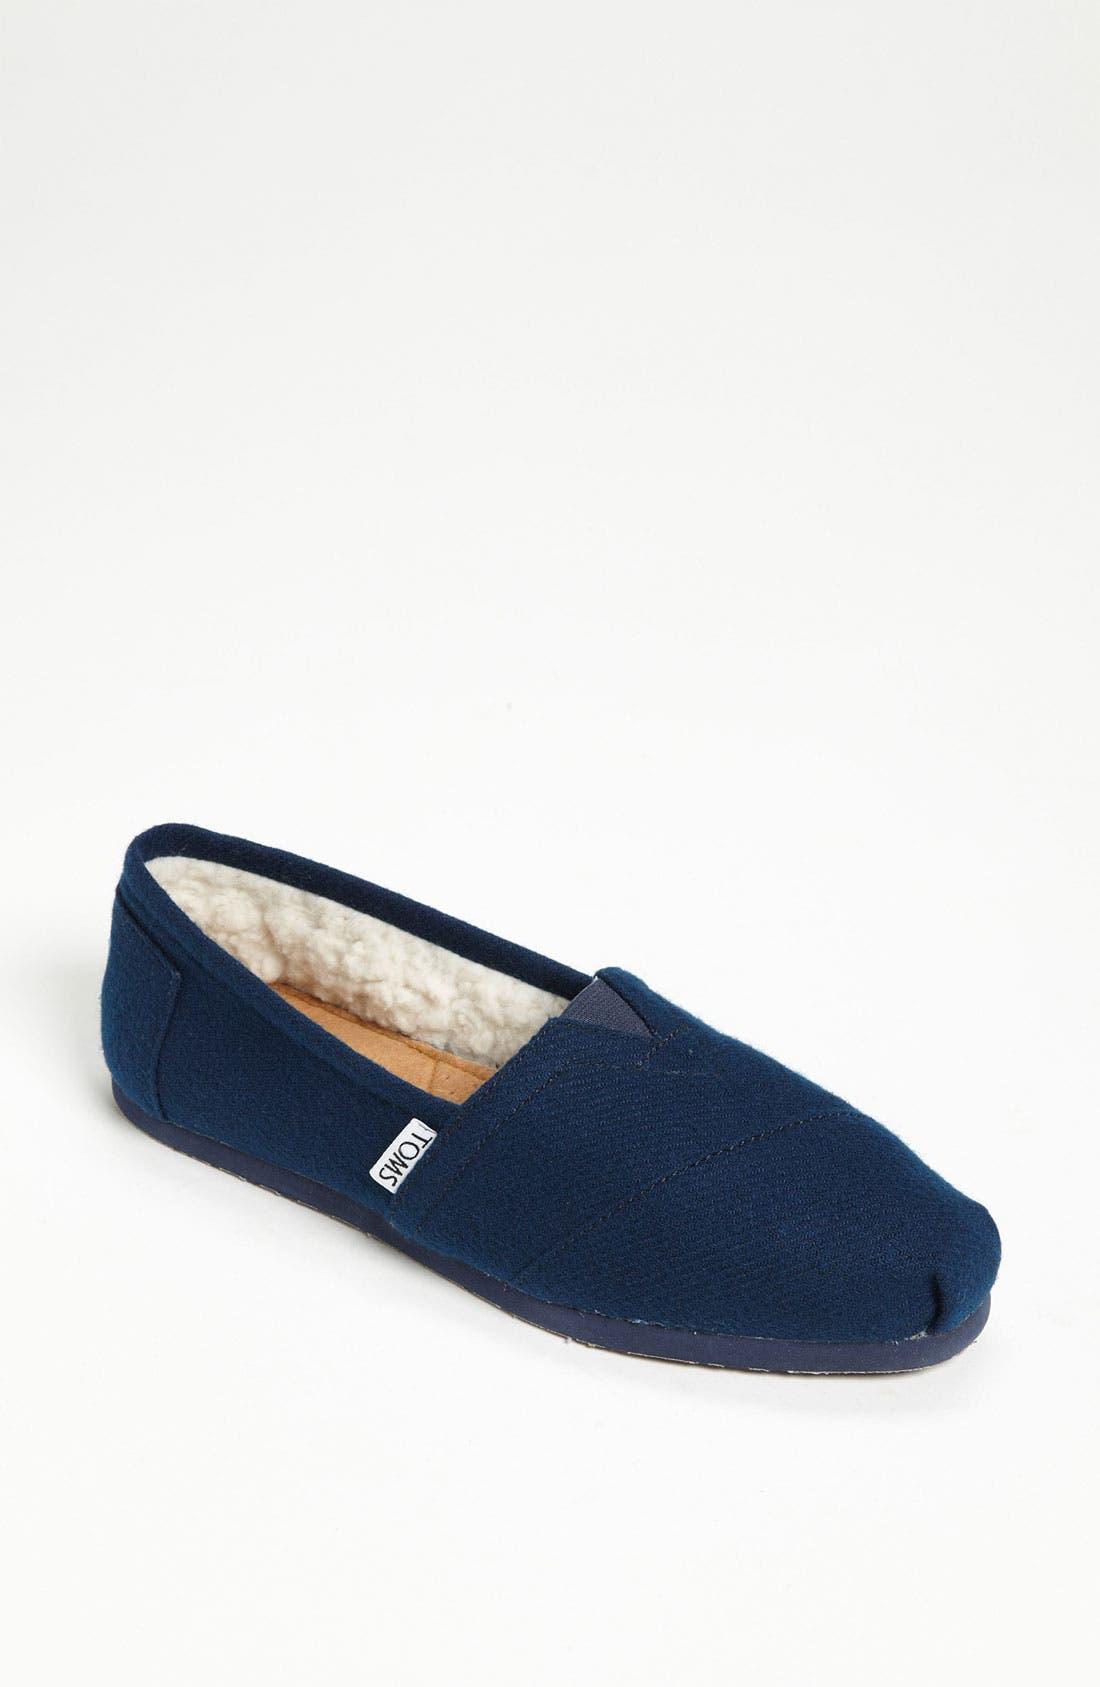 Alternate Image 1 Selected - TOMS 'Classic' Woolen Slip-On (Women) (Nordstrom Exclusive)